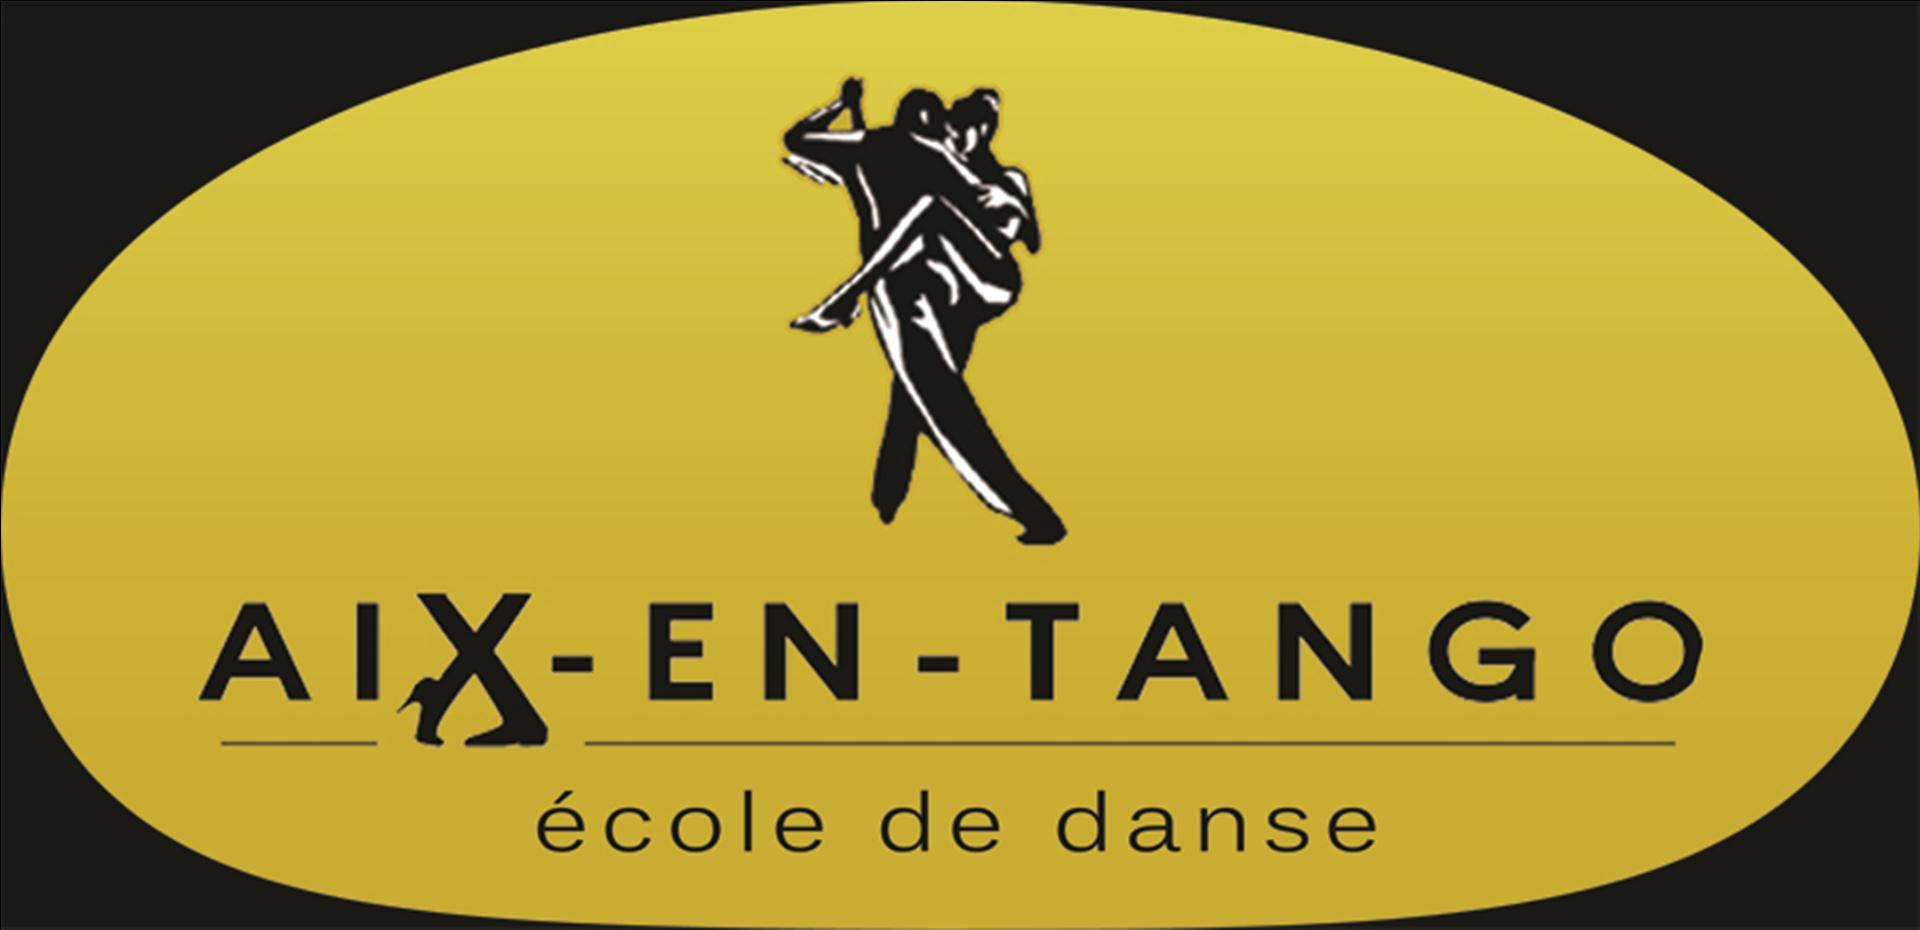 Aix-en-tango ‹ Corazon de Tango